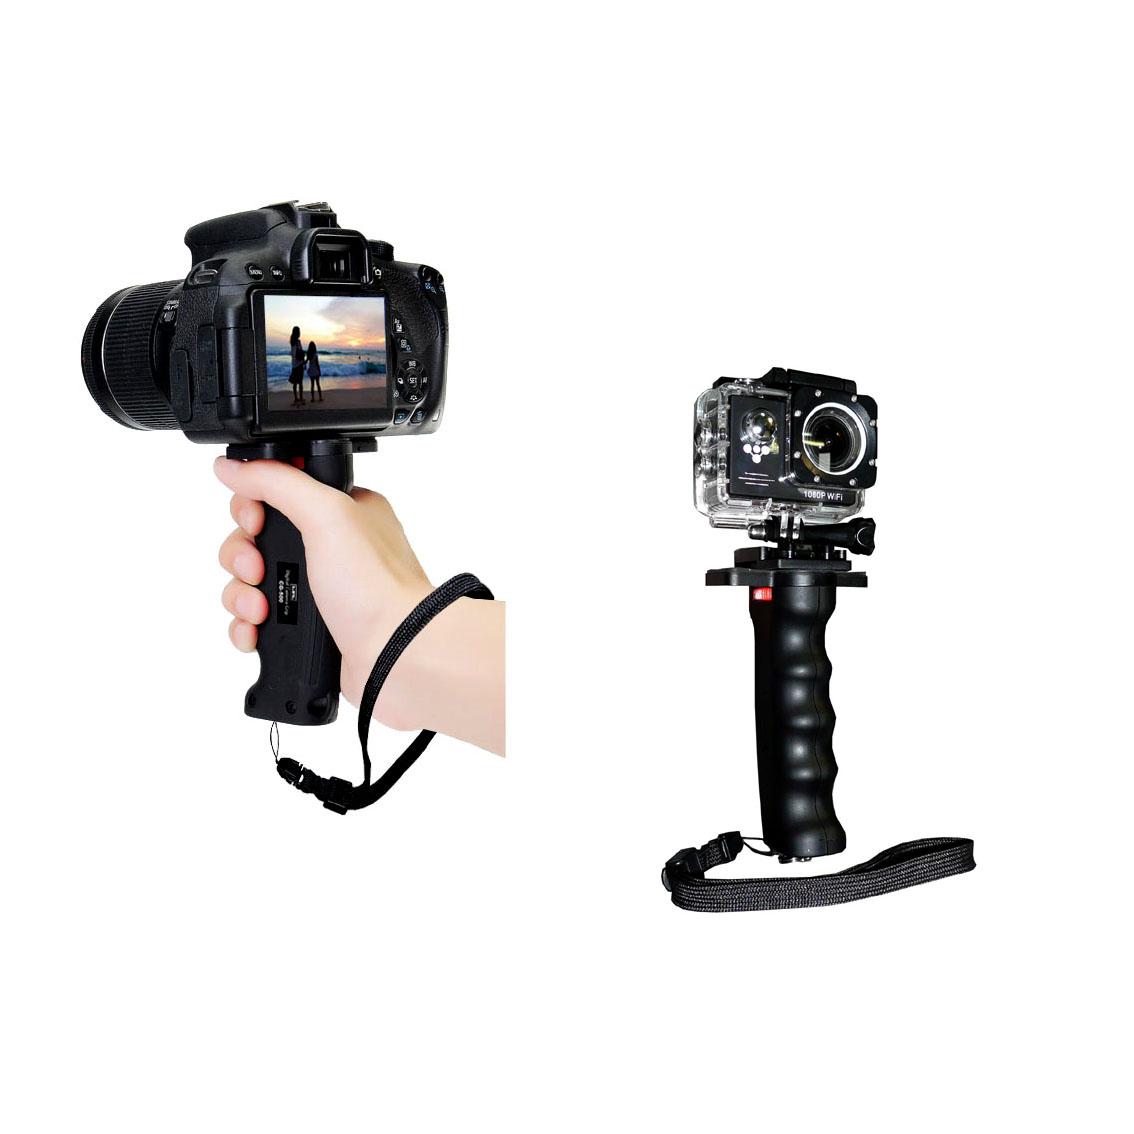 「Digital camera grip CG-500」